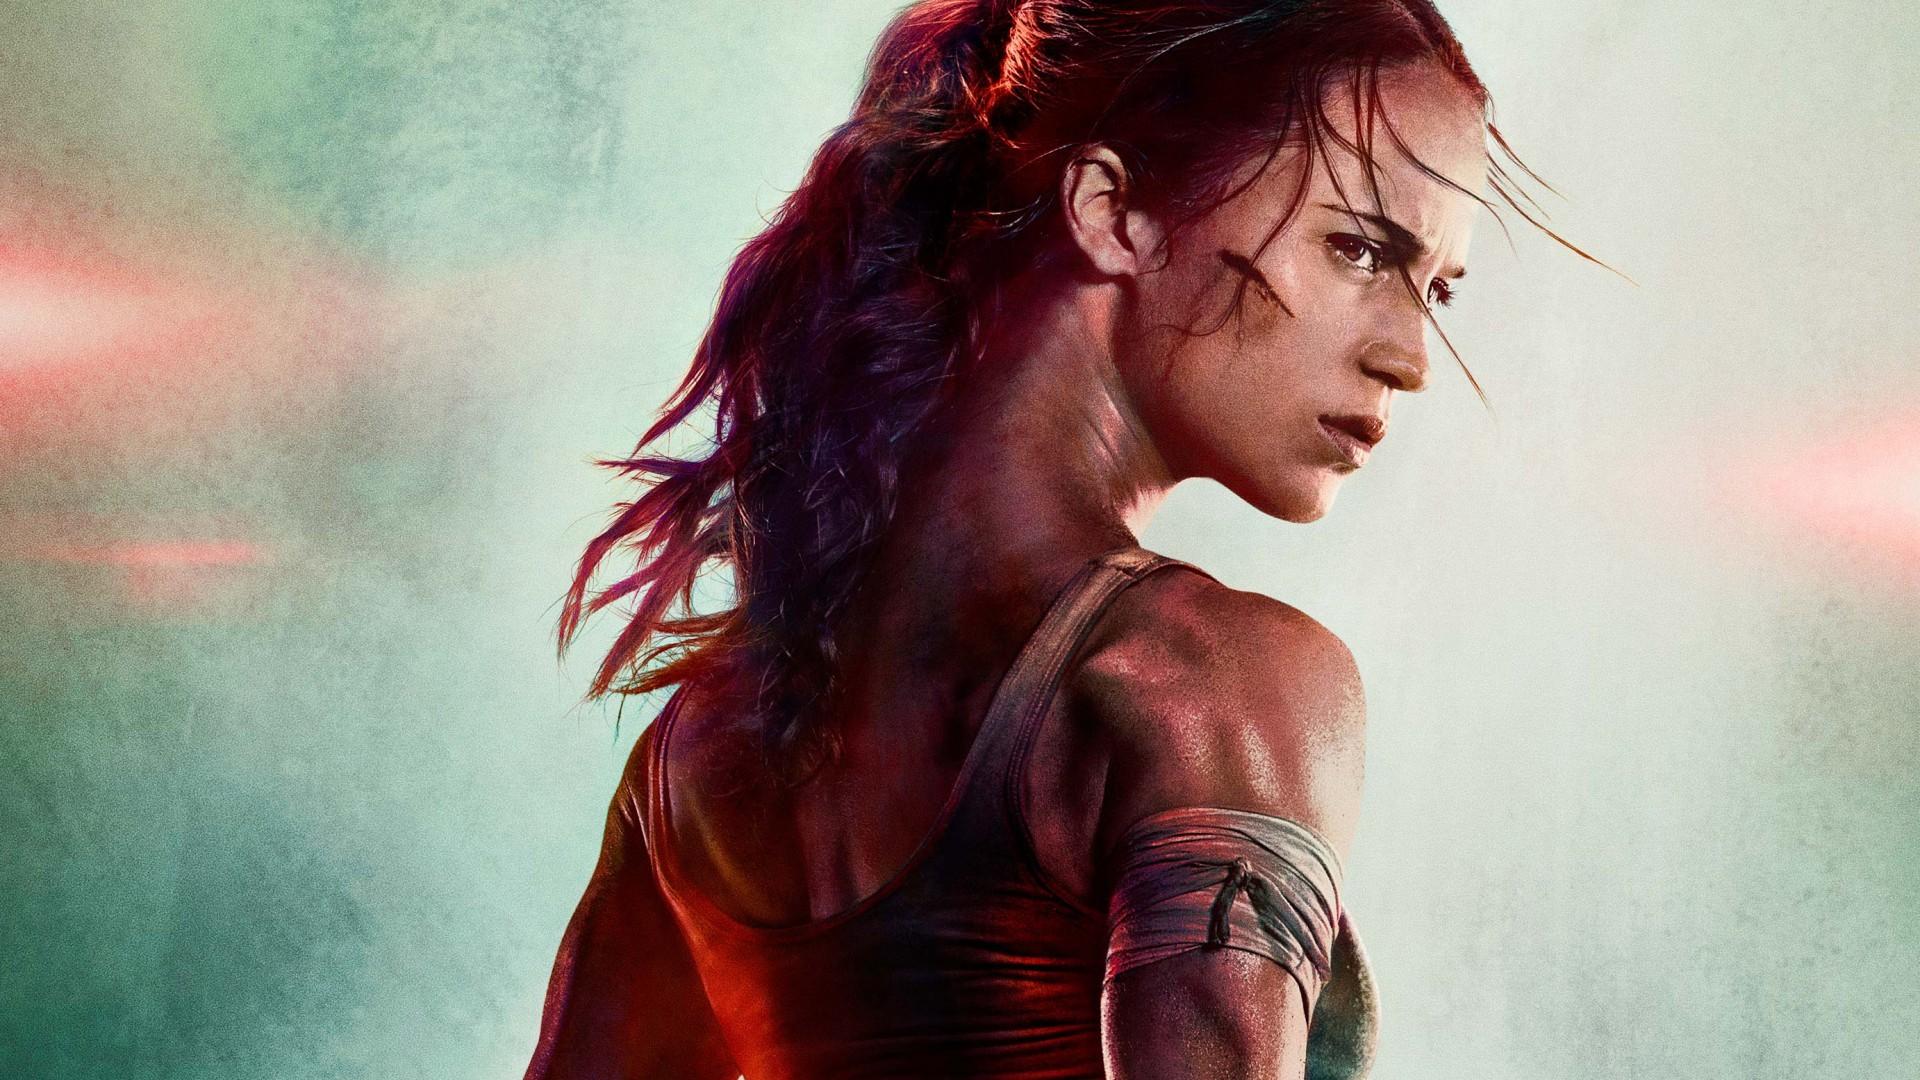 Movies / Tomb Raider Wallpaper